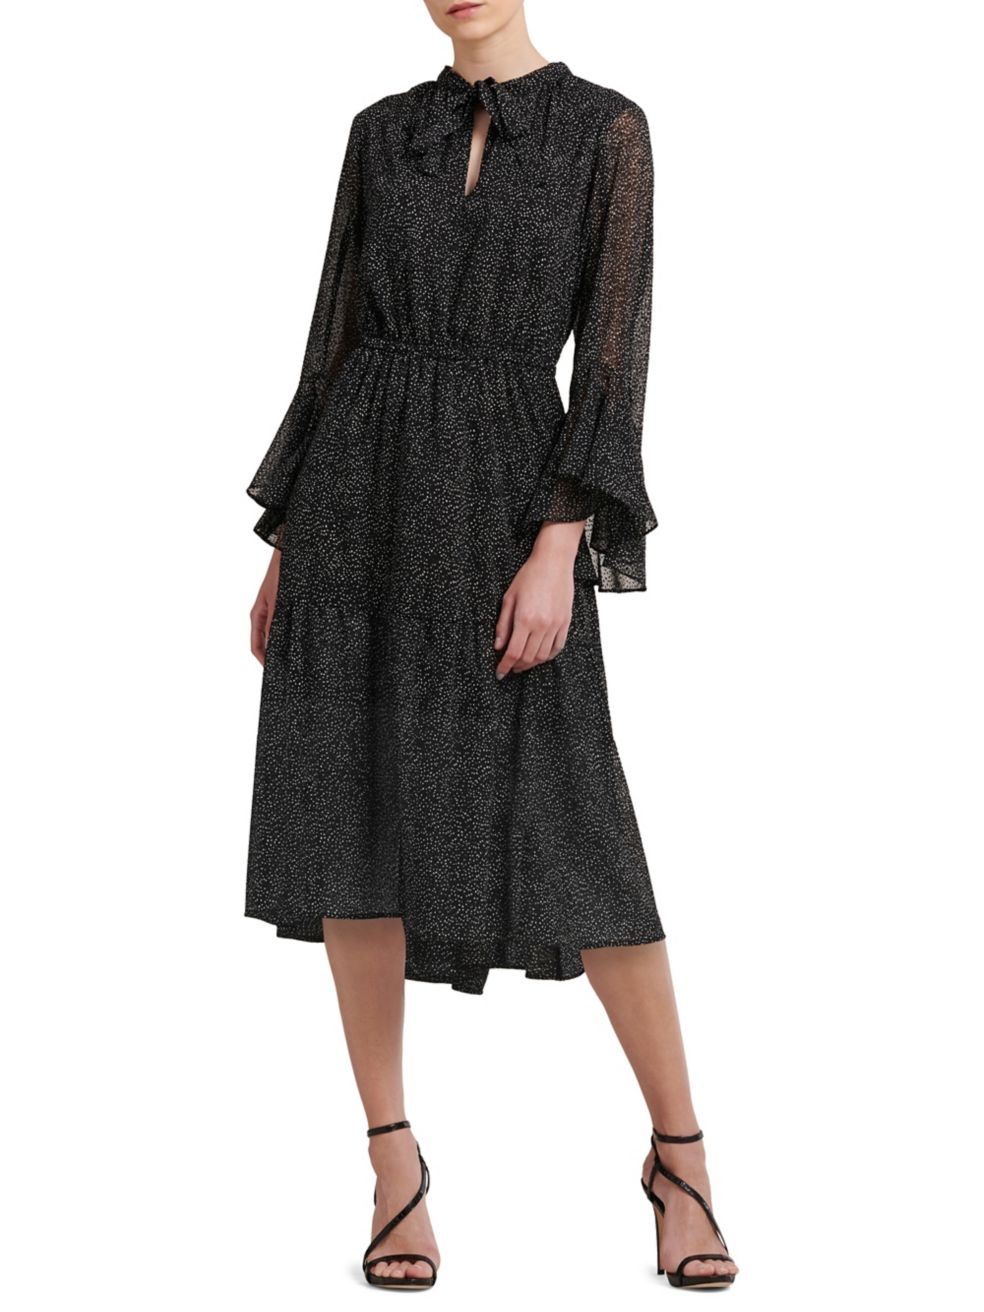 Self-Tie Bell-Sleeve Dress - $175 | $122.50 on sale with code: FRIENDS, Donna Karan.